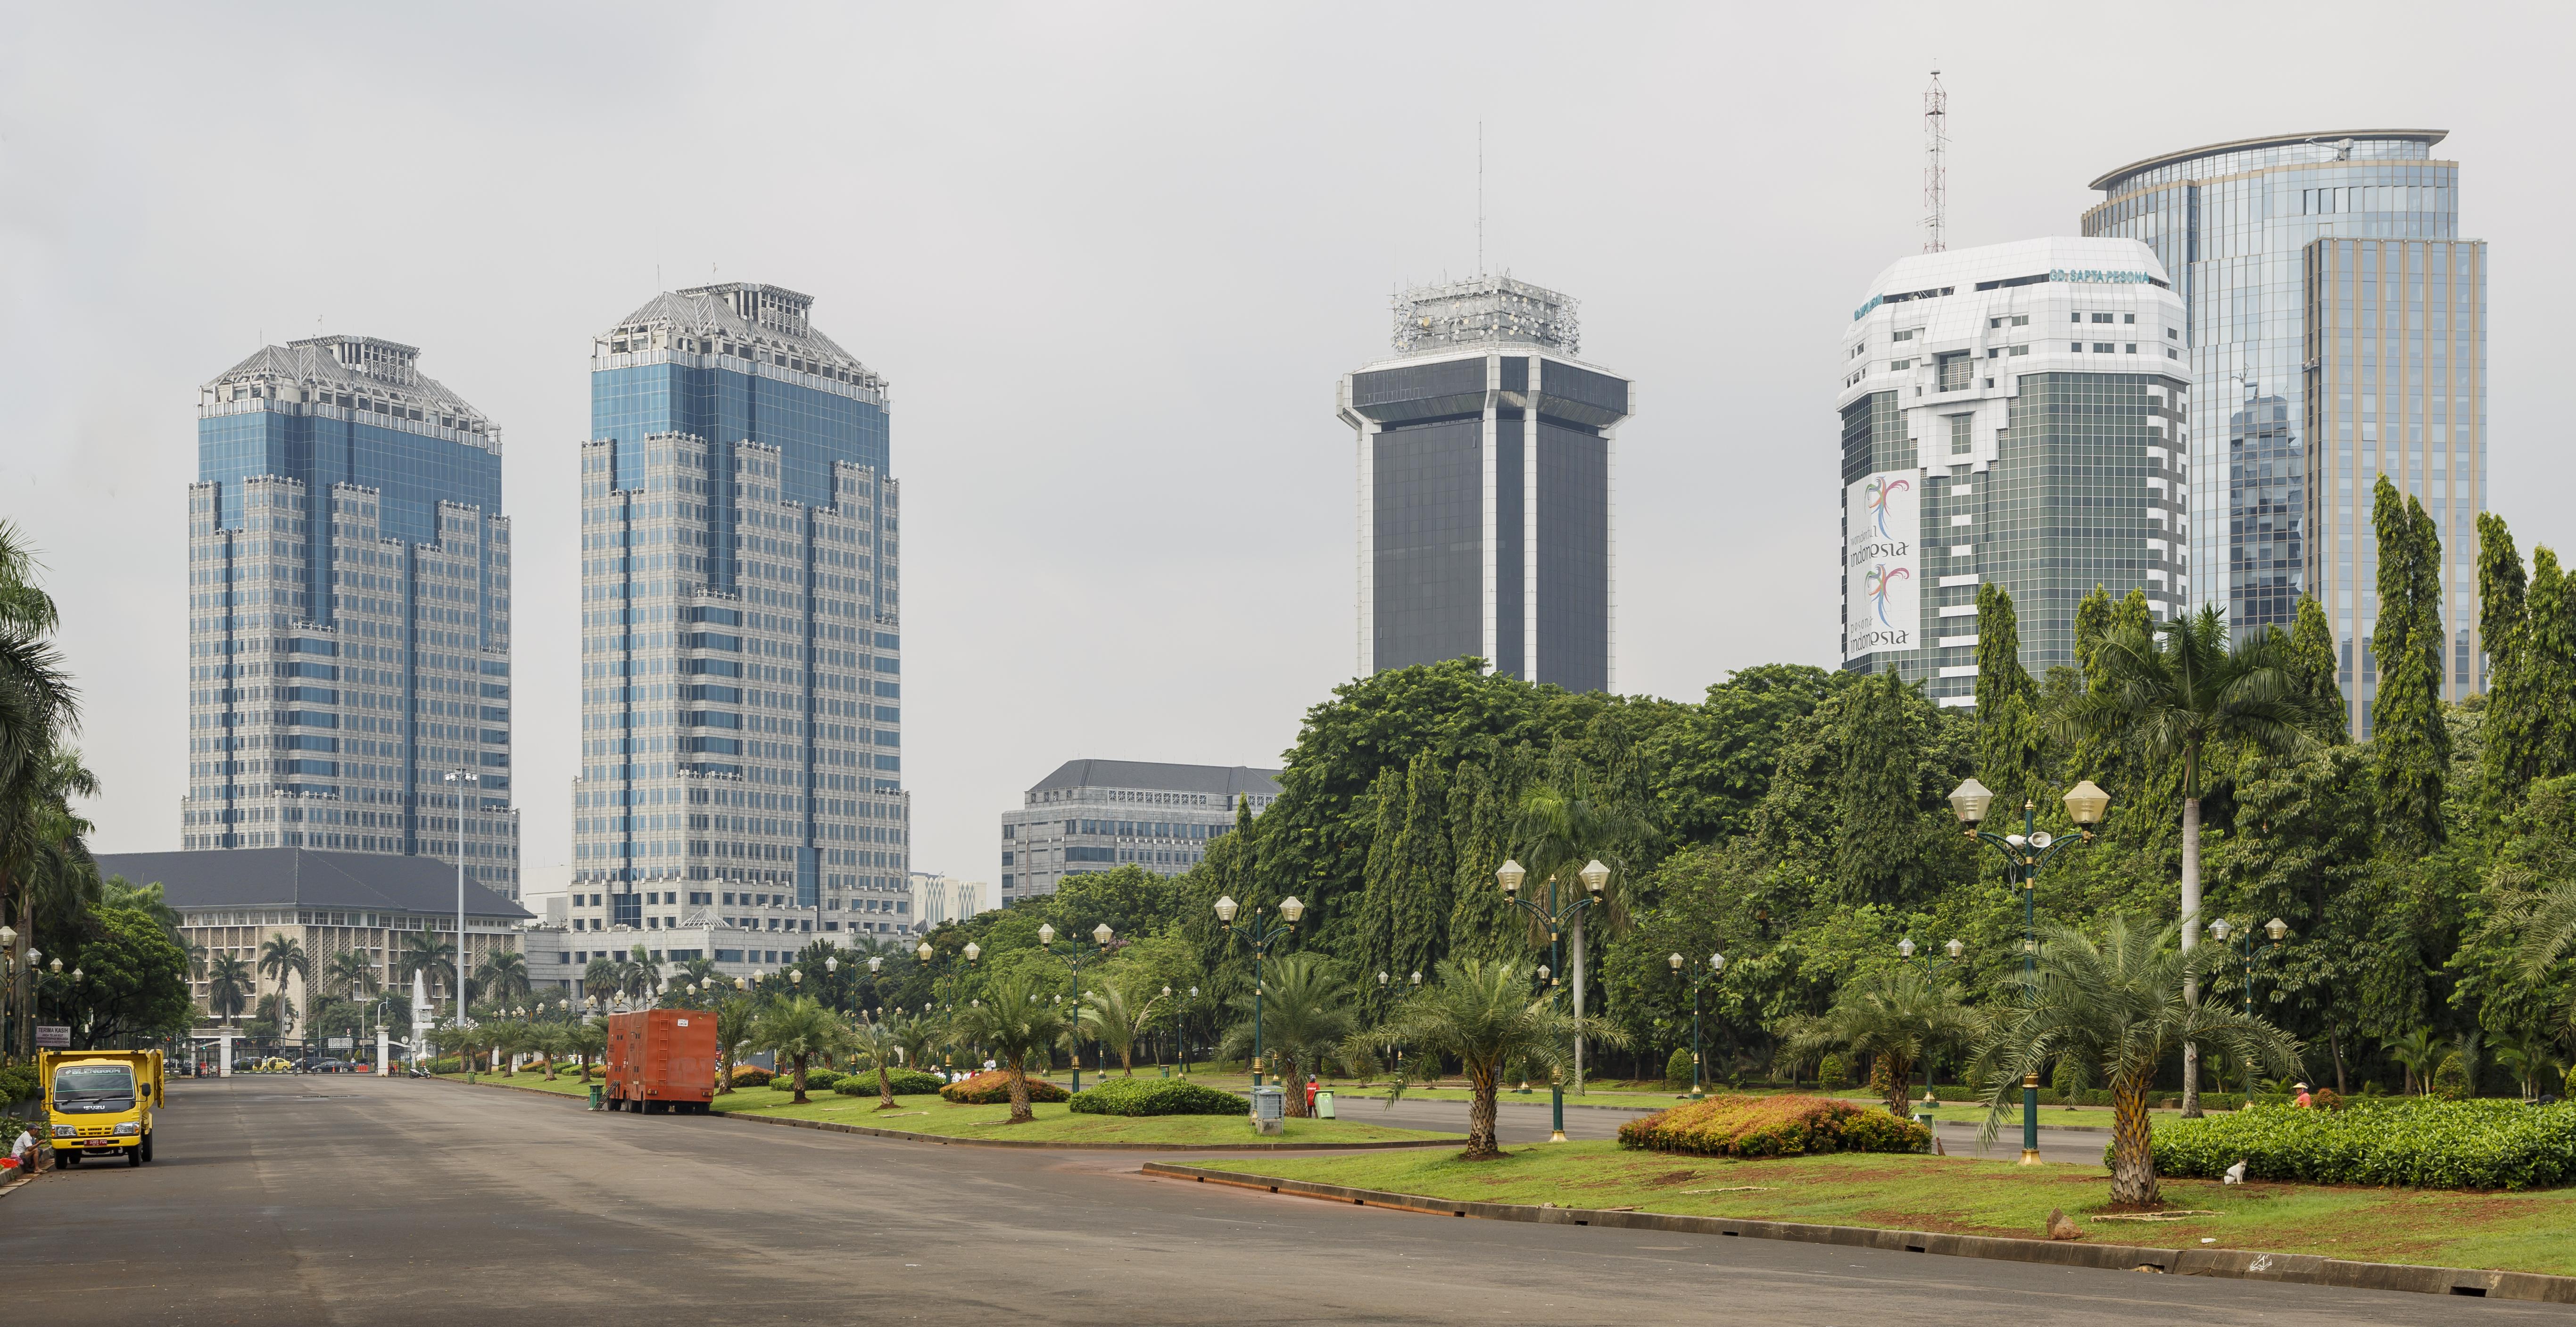 acfta indonesia trade Asean-china free trade area (acfta) di indonesia terhadap economic yang ditimbulkan oleh asean-china free trade area (acfta) terhadap keamanan ekonomi di jawa timur.